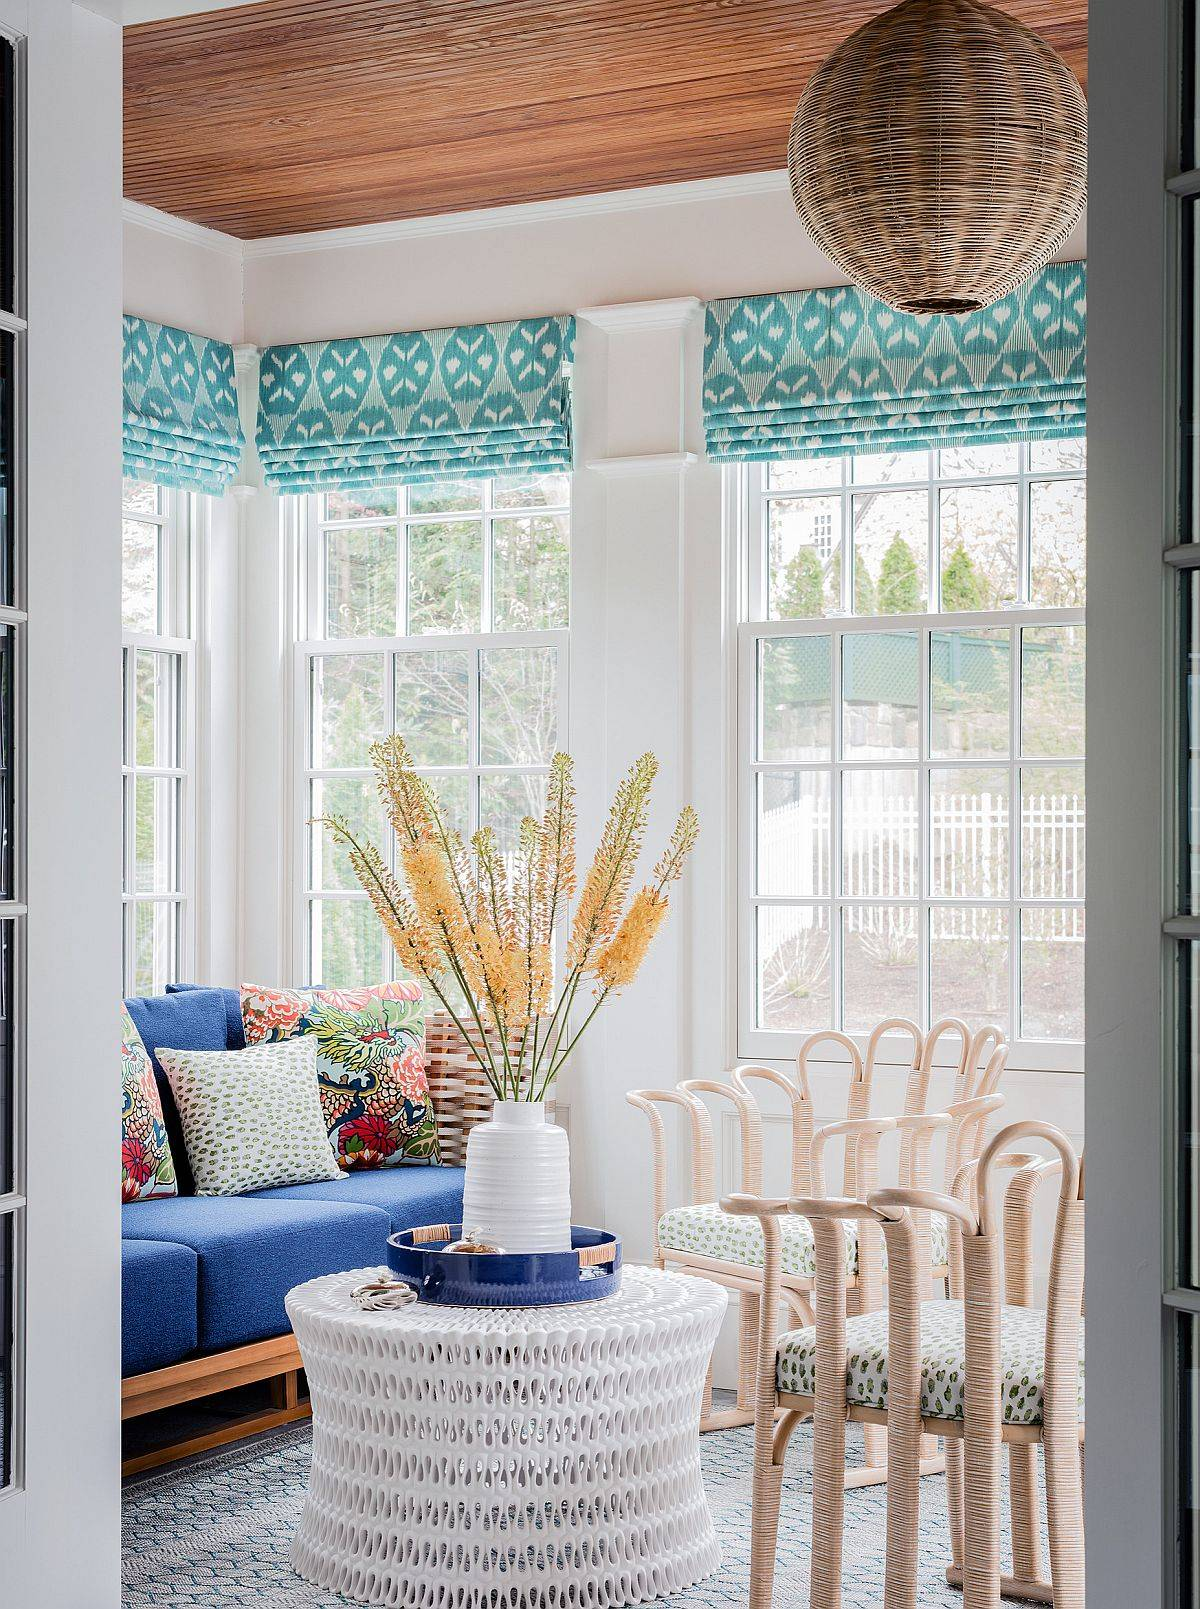 Colorful-and-small-modern-sunroom-idea-60577